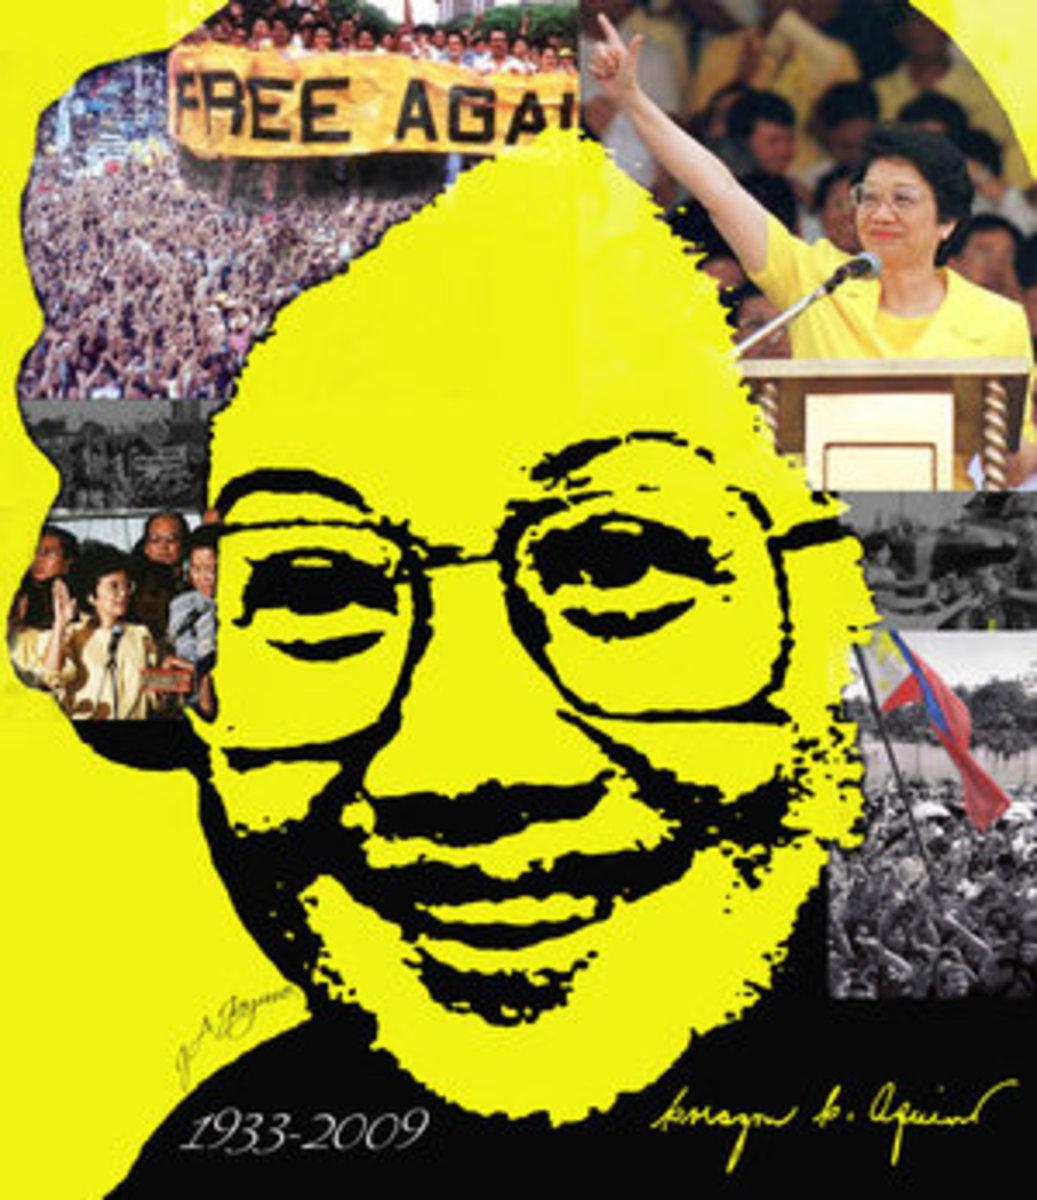 photo from: http://th04.deviantart.net/fs47/300W/i/2009/215/f/0/Mother_of_Edsa_Revolution_by_taikun21.jpg